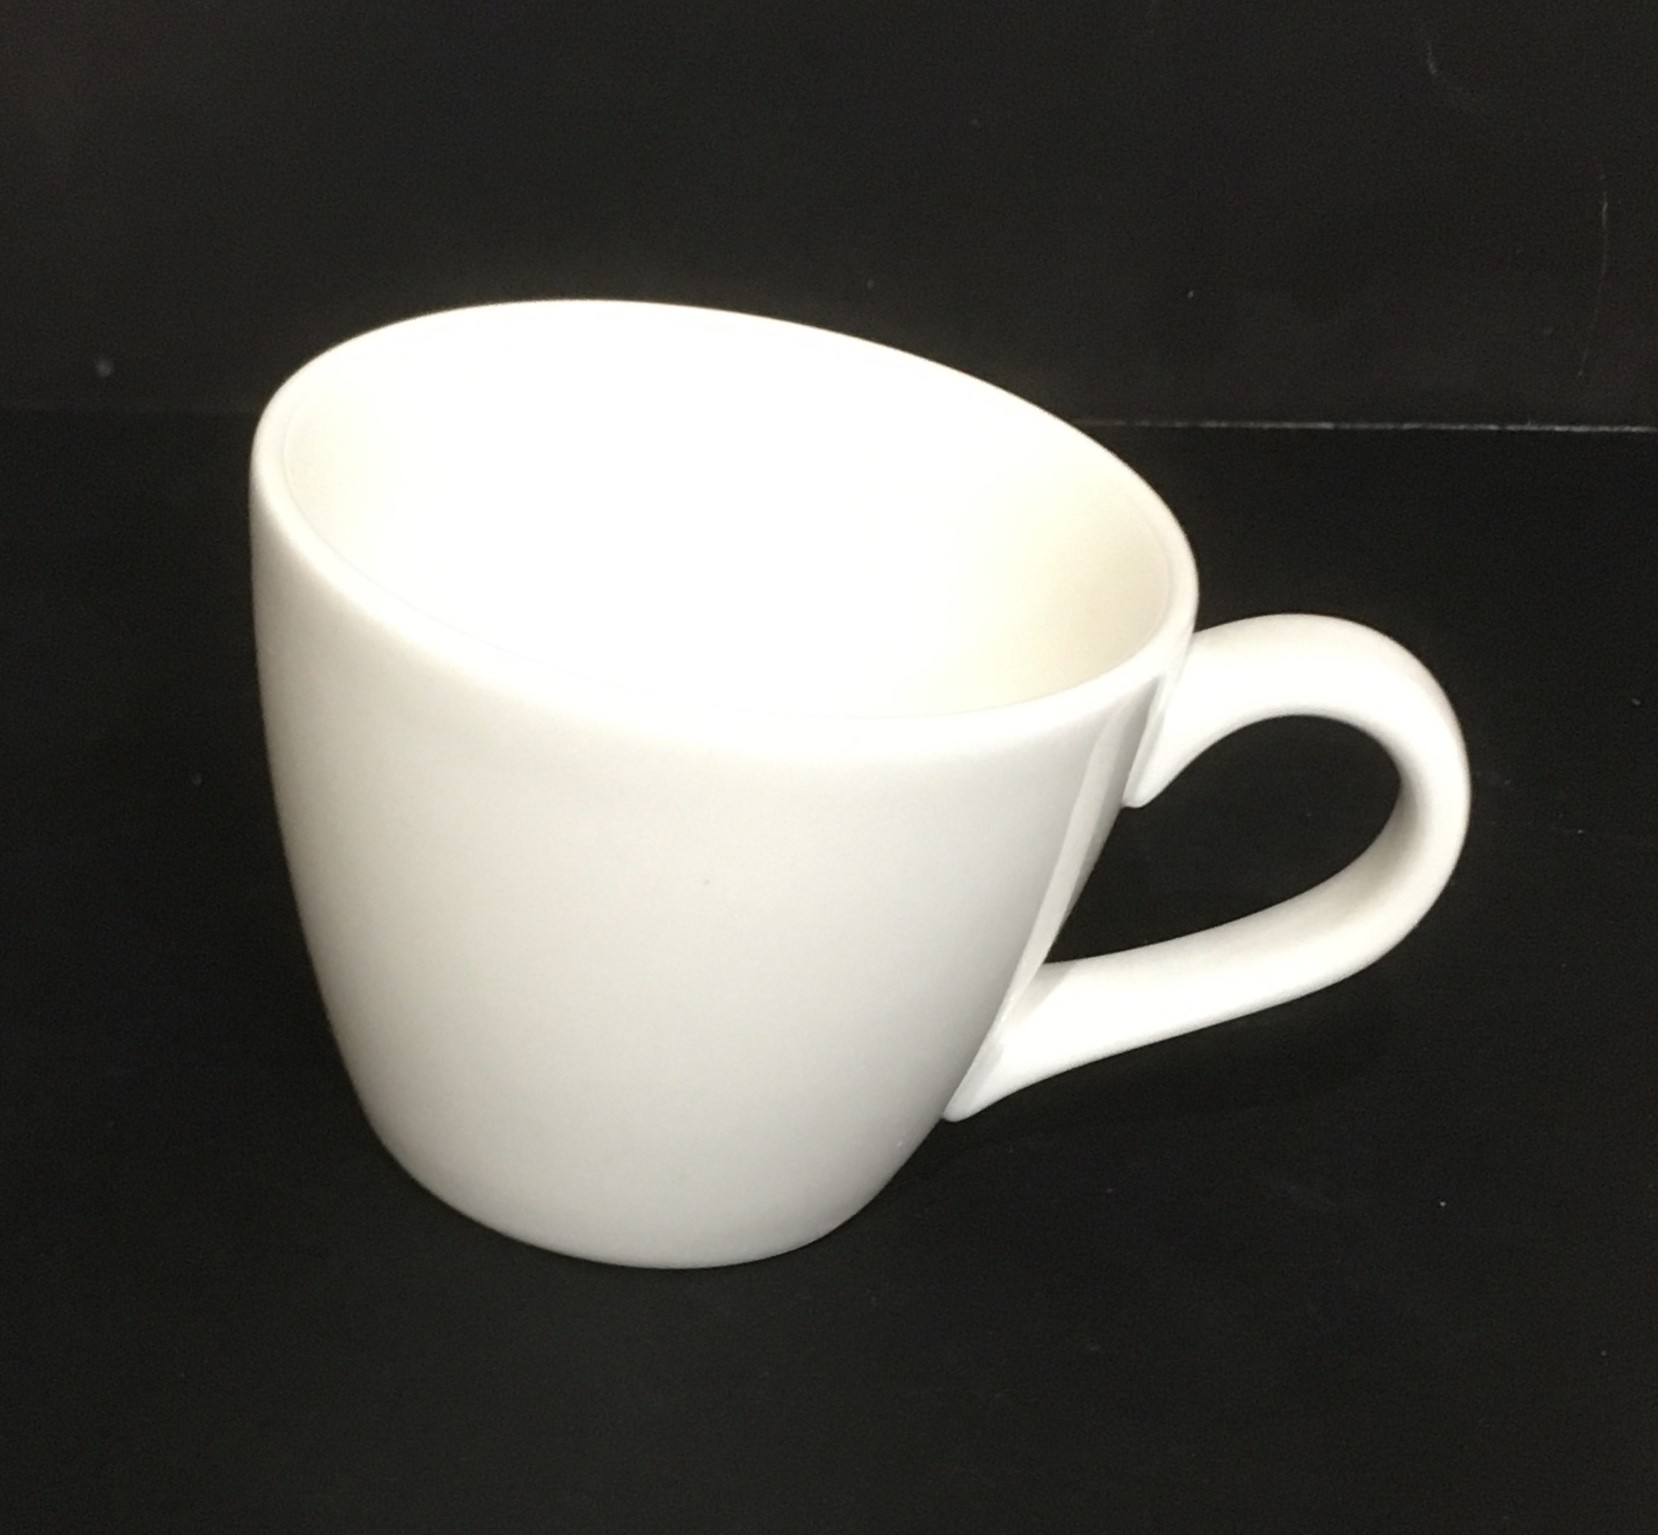 Buy the Elia Orientix Espresso Cup online at smithsofloughton.com